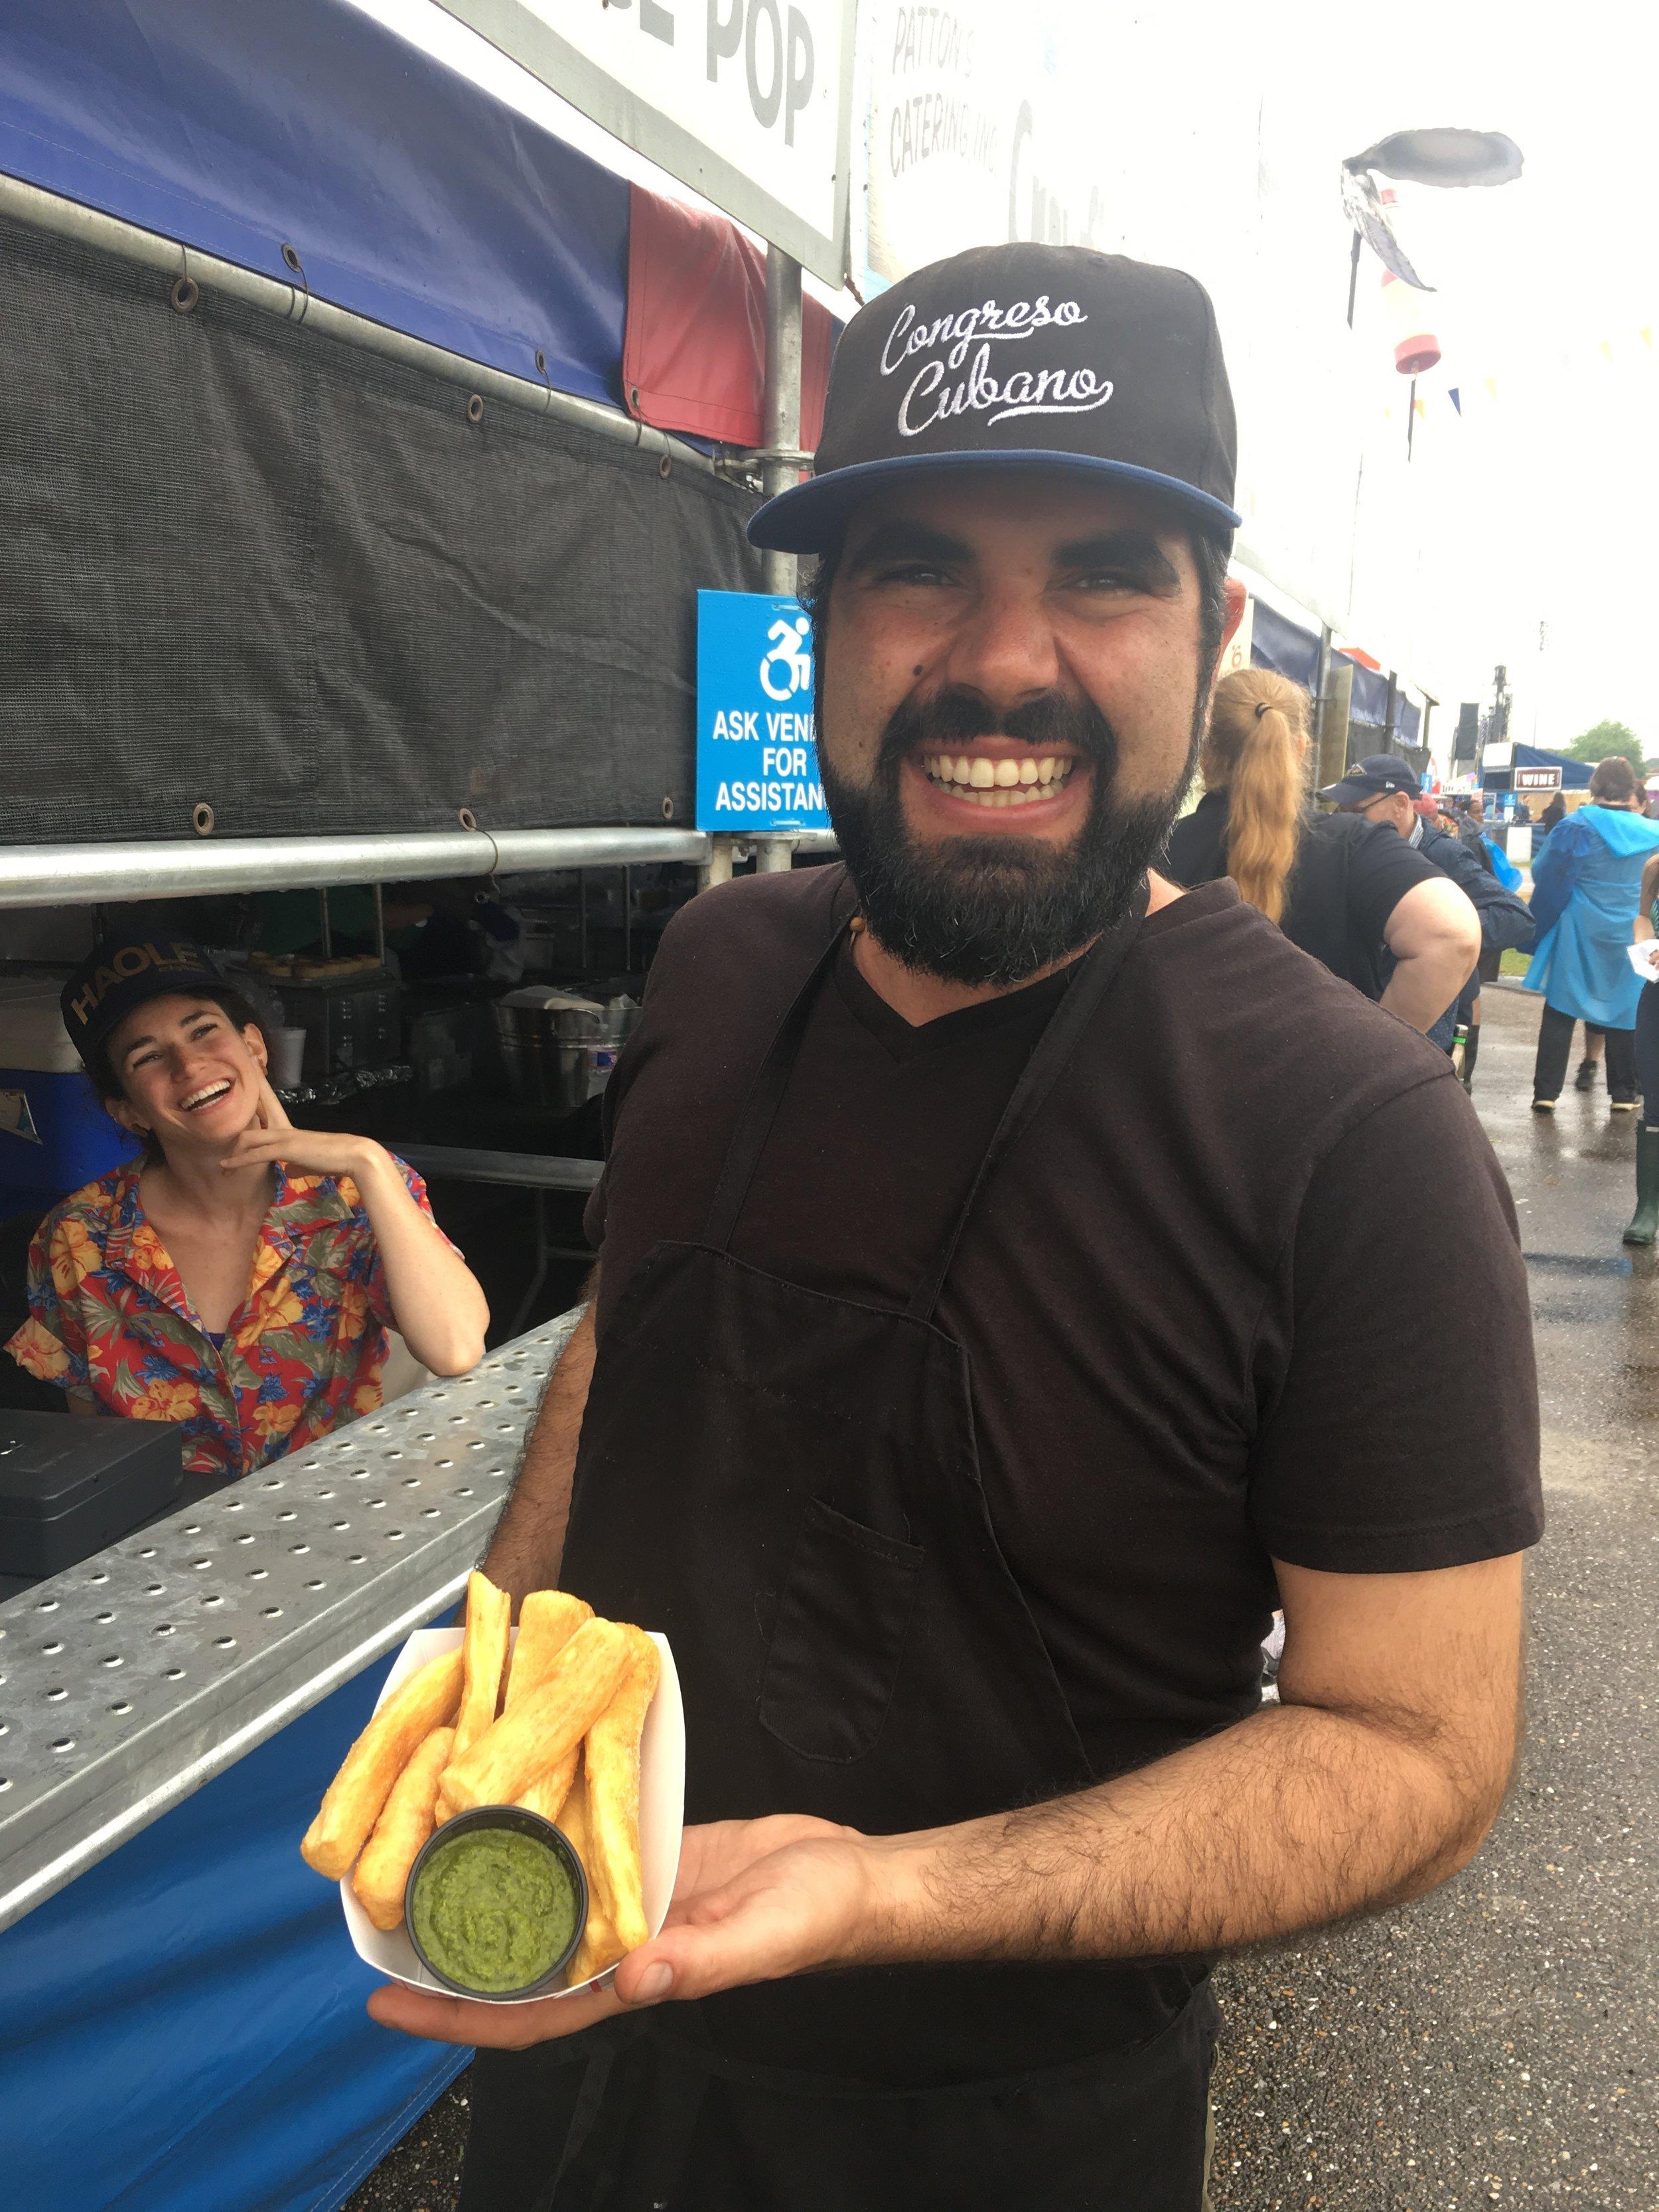 Orlando Vega At Congreso Cubano booth w/yucca fries & chimichurri.  Credit: Poppy Tooker, Louisiana Eats